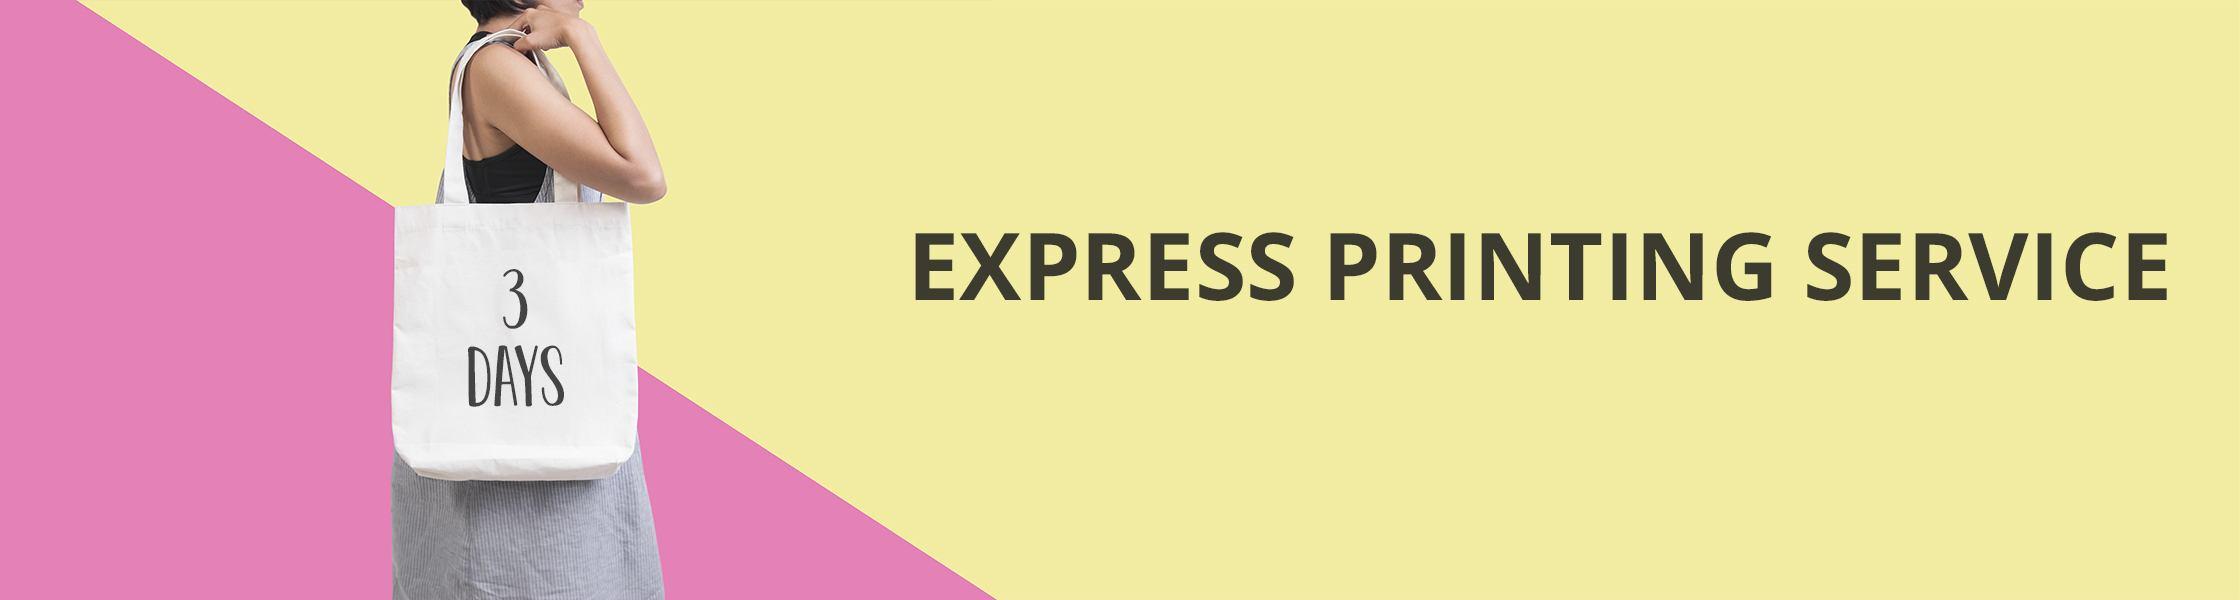 3 Days - Express printing service